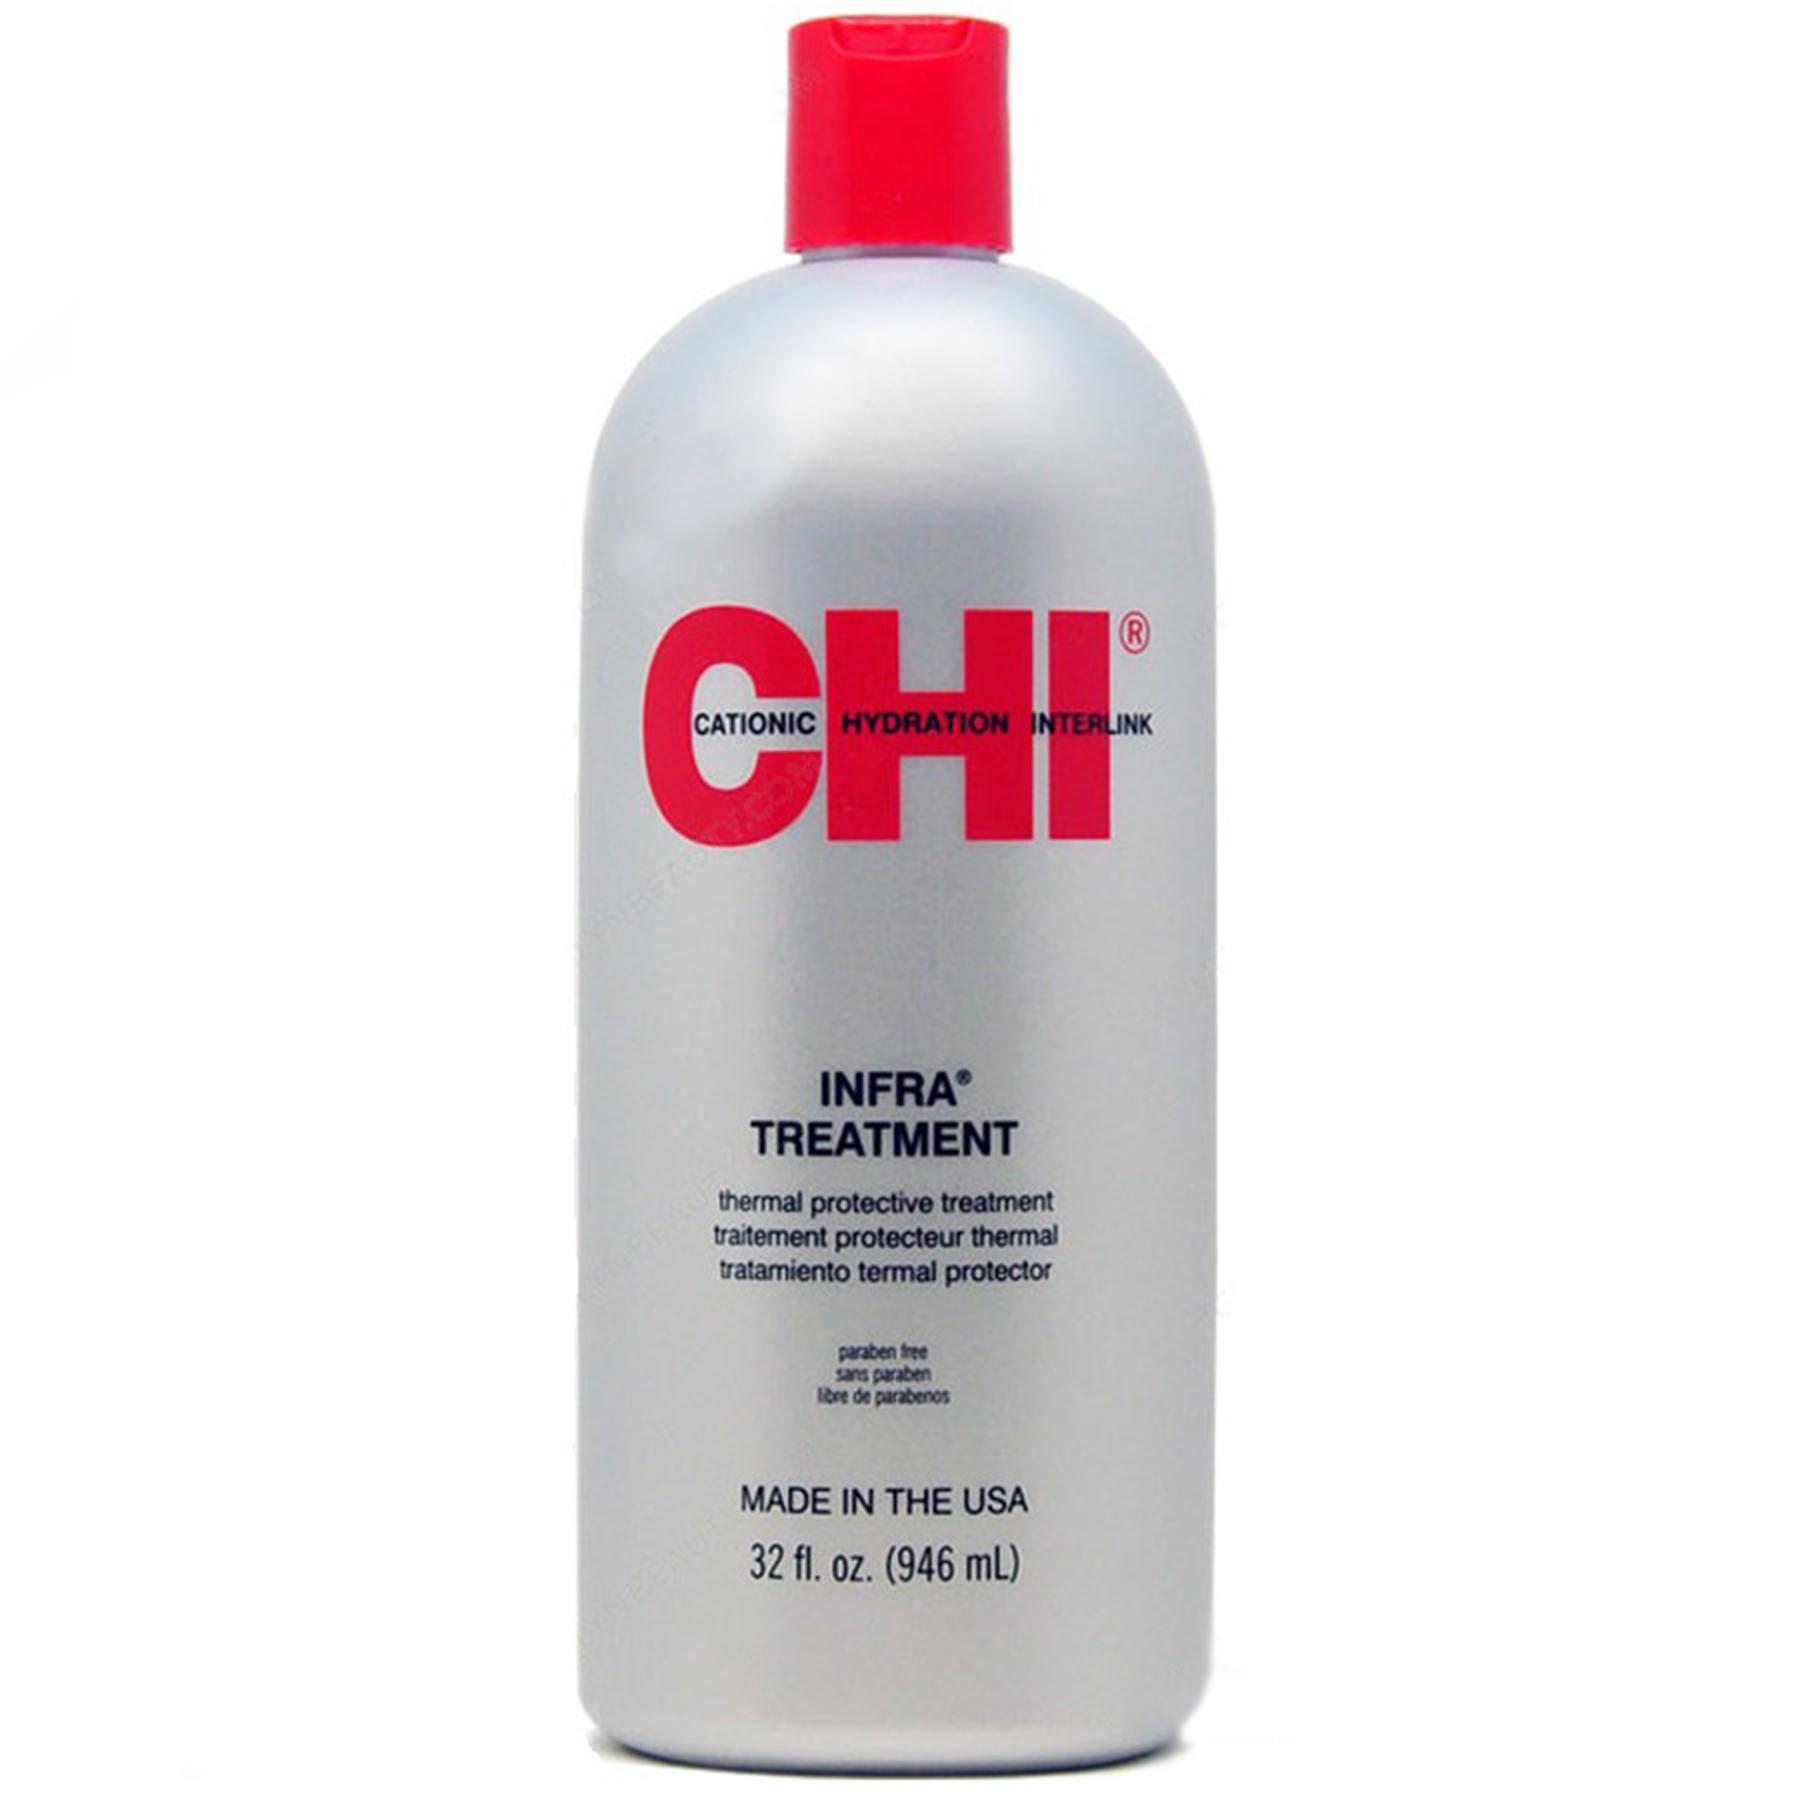 Купить Маски для волос CHI, Инфра маска для волос CHI Infra Treatment 950 мл